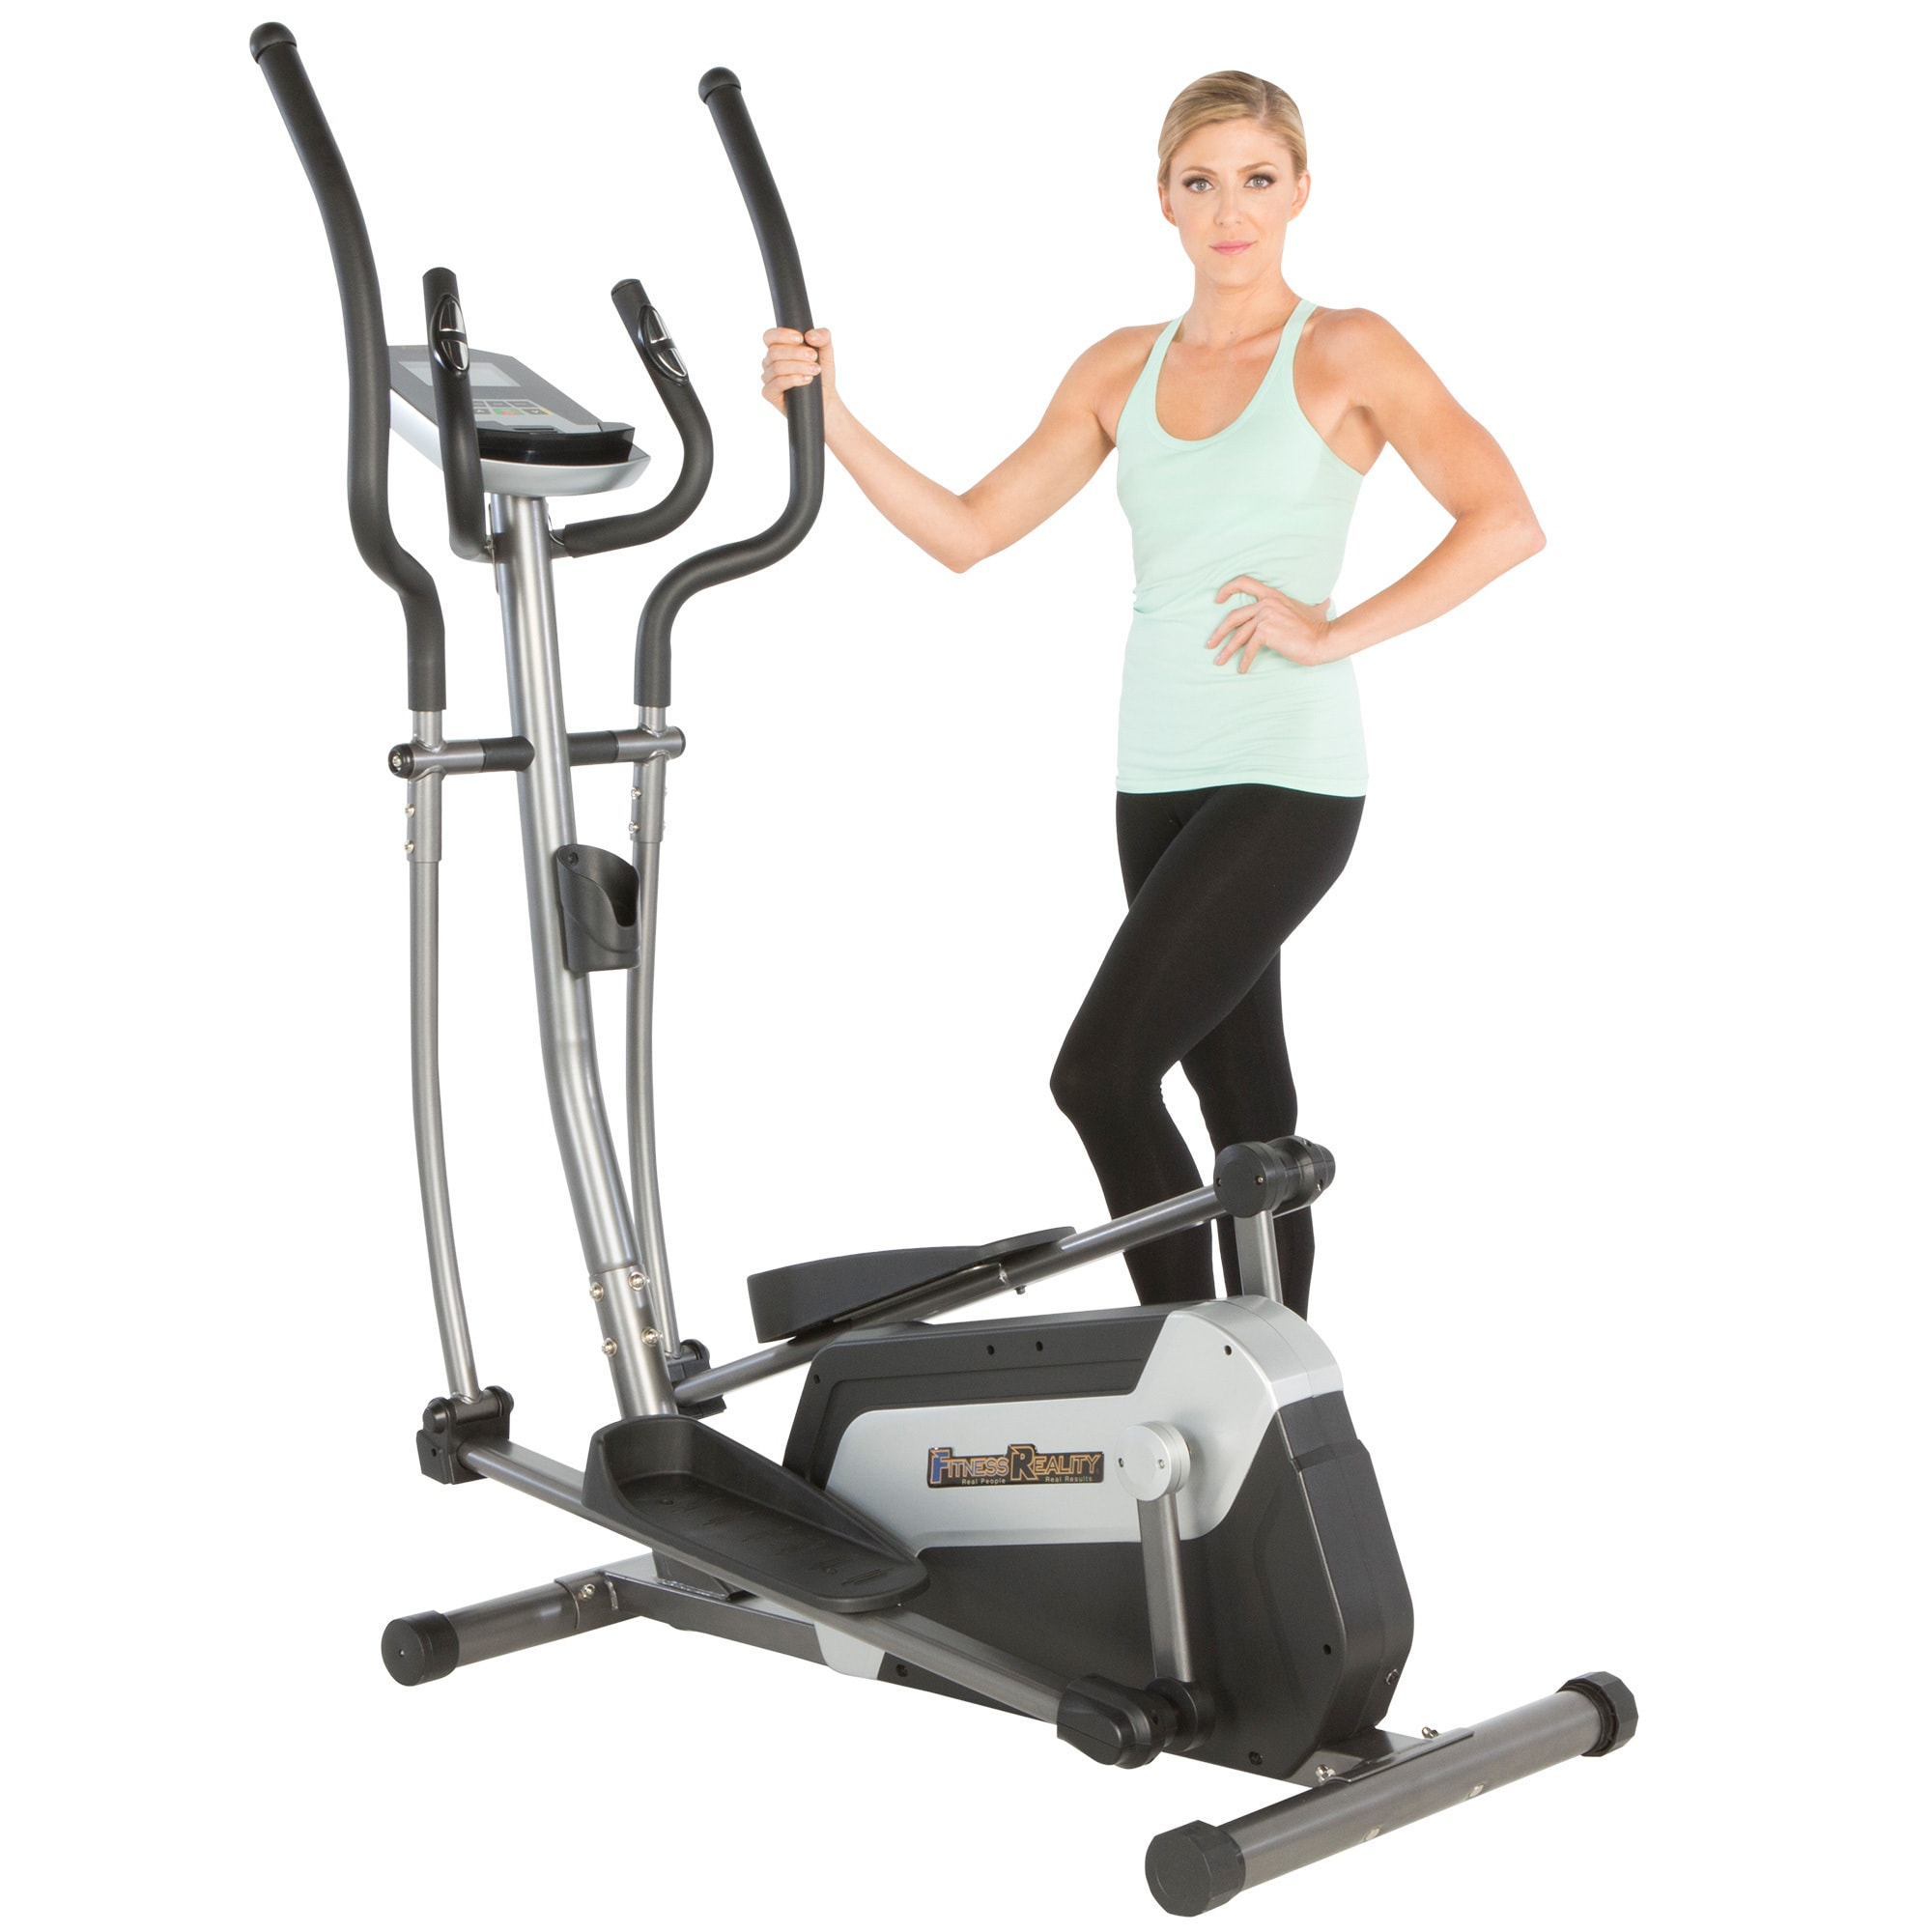 mat trainer itm exercise elliptical bike hybrid cardio pro mats proform resource crossover floor